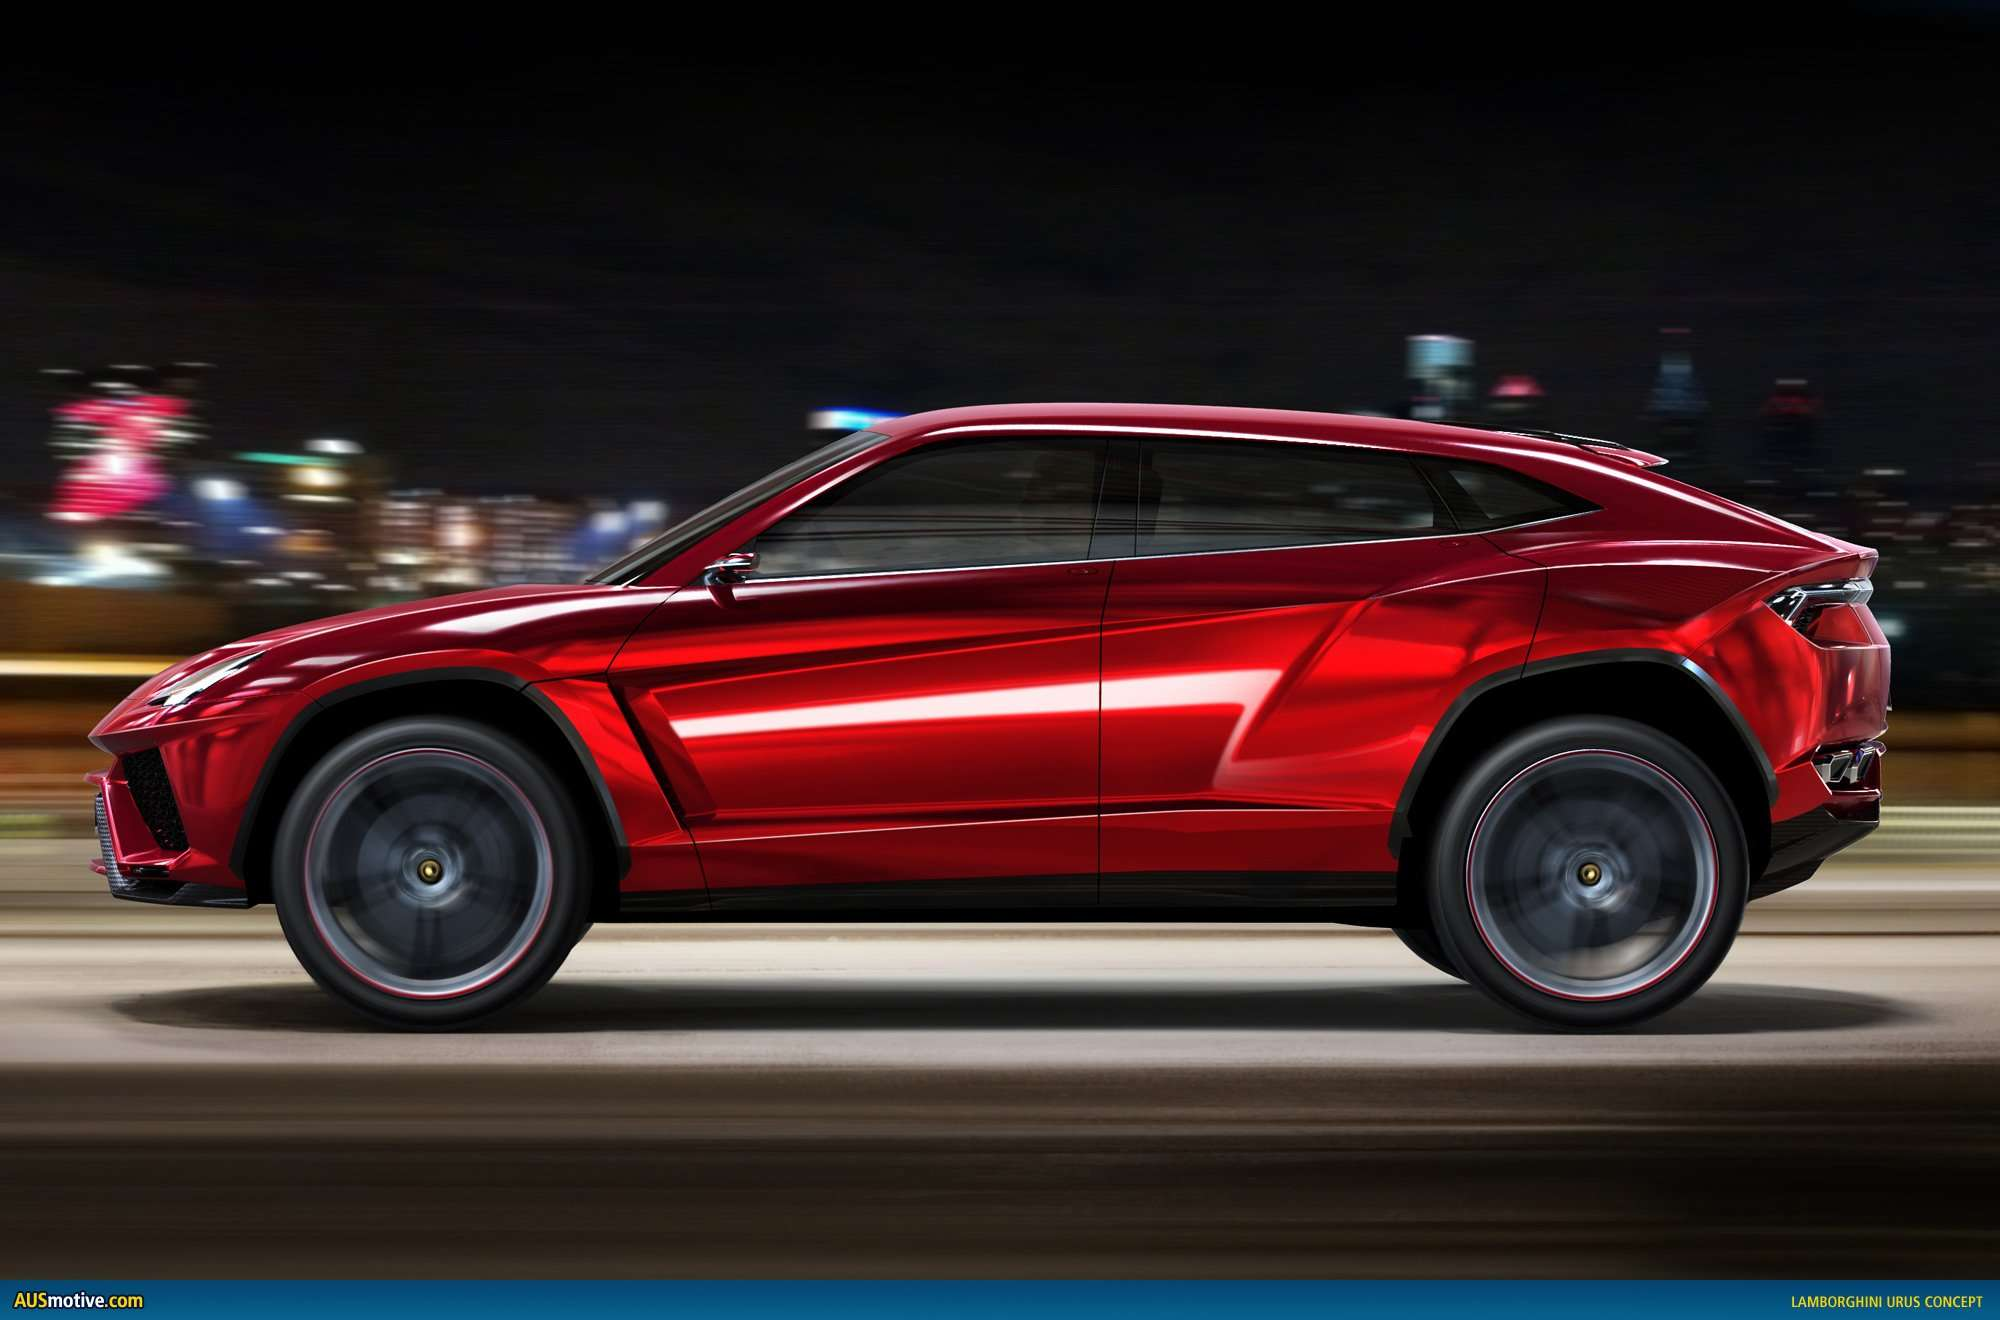 Lamborghini Urus Tak Minat Pecahkan Rekor Nurburgring